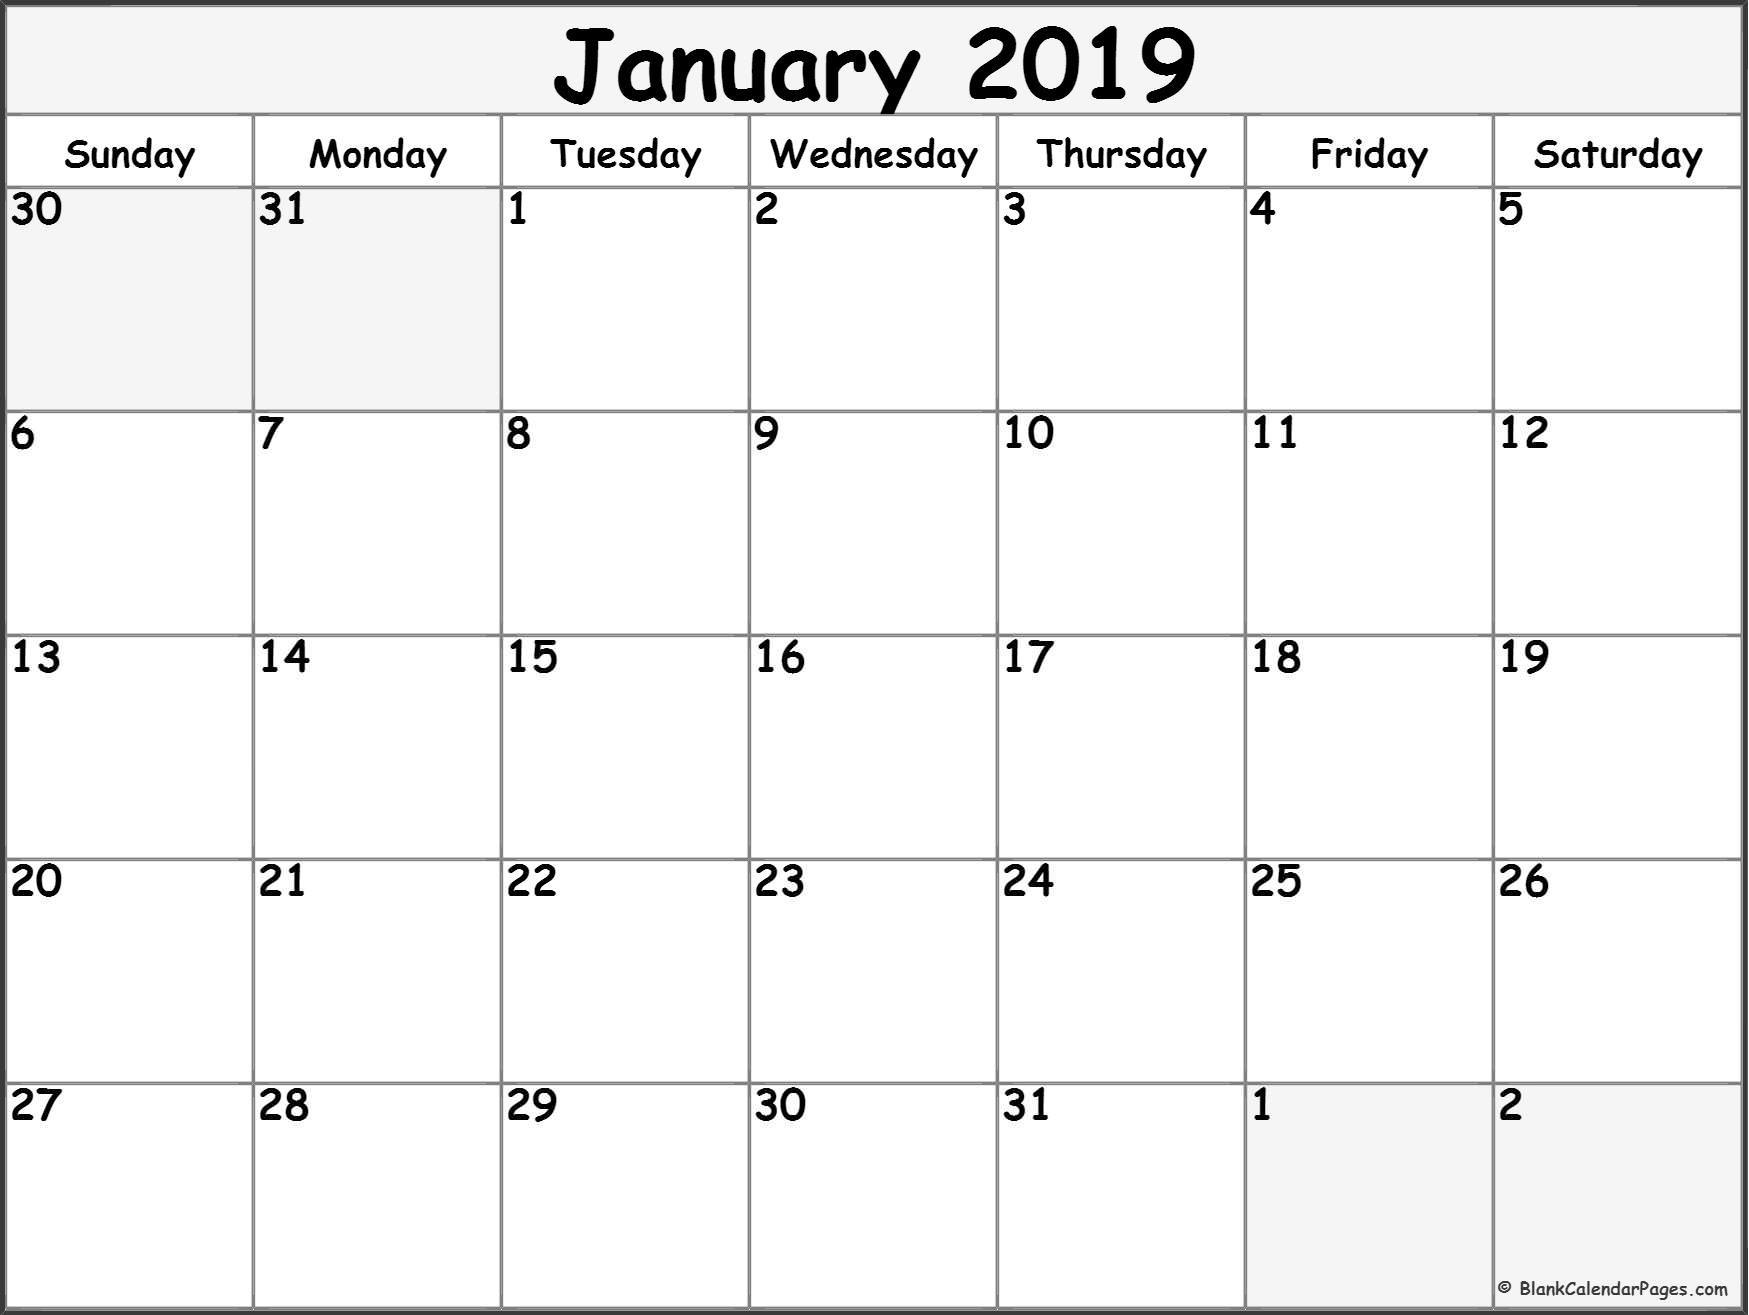 January 2019 Free Printable Blank Calendar Collection. With Calendar inside Free Printable Blank Calendars